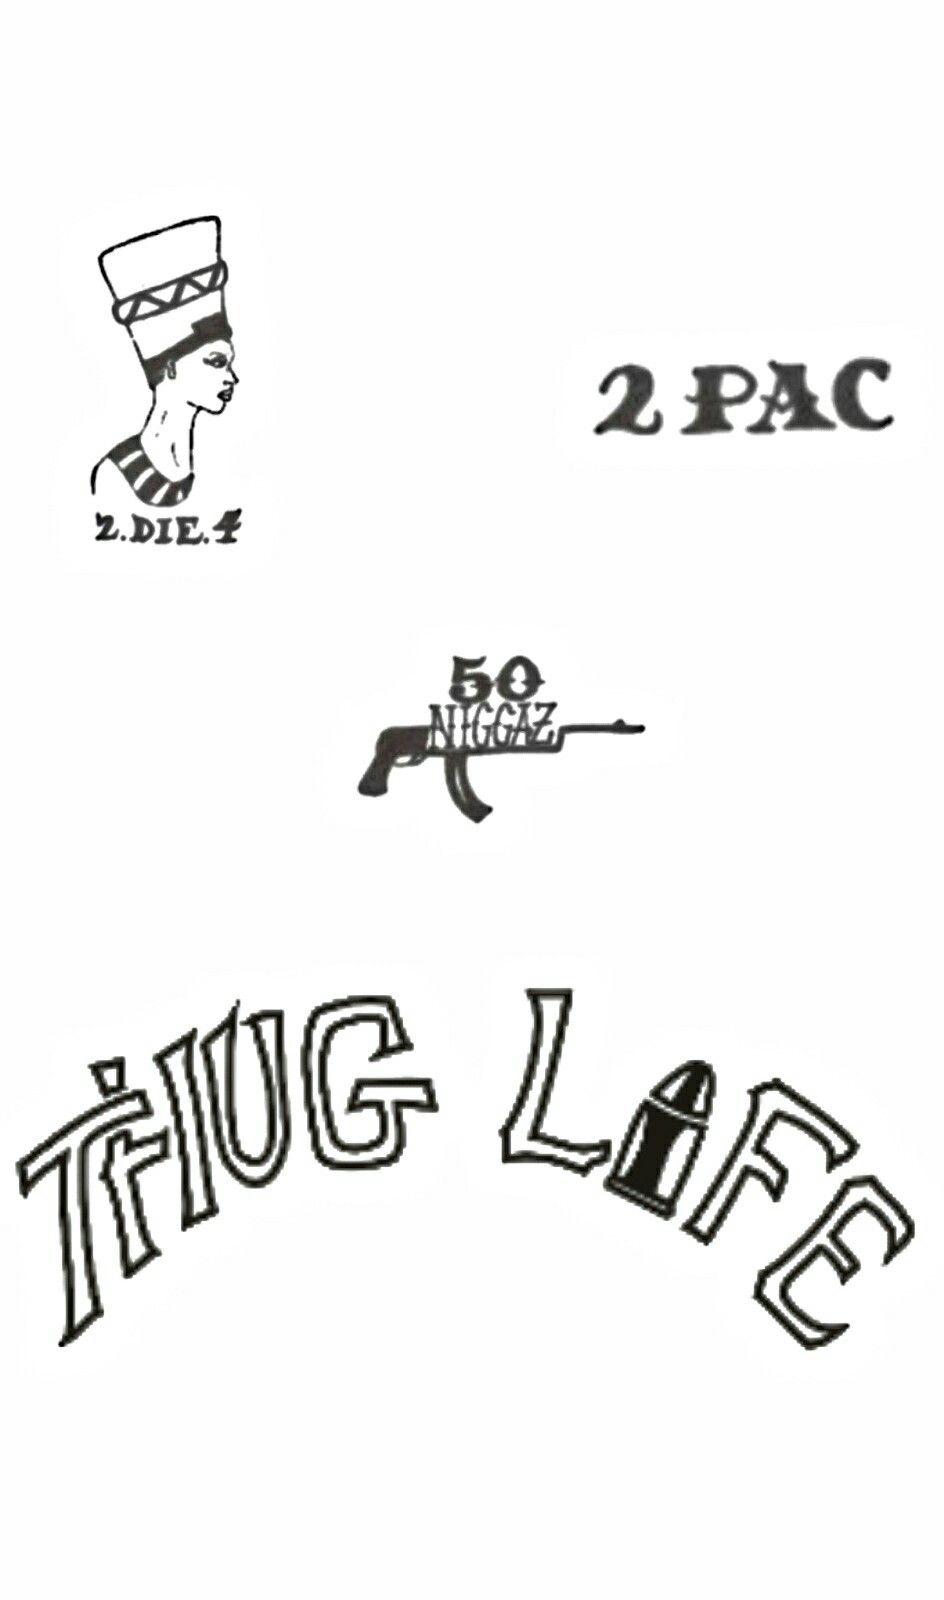 2pac Thug Life Wallpaper Tatuagem De Hip Hop Tatuagem Flash De Tatuagem [ 1600 x 944 Pixel ]